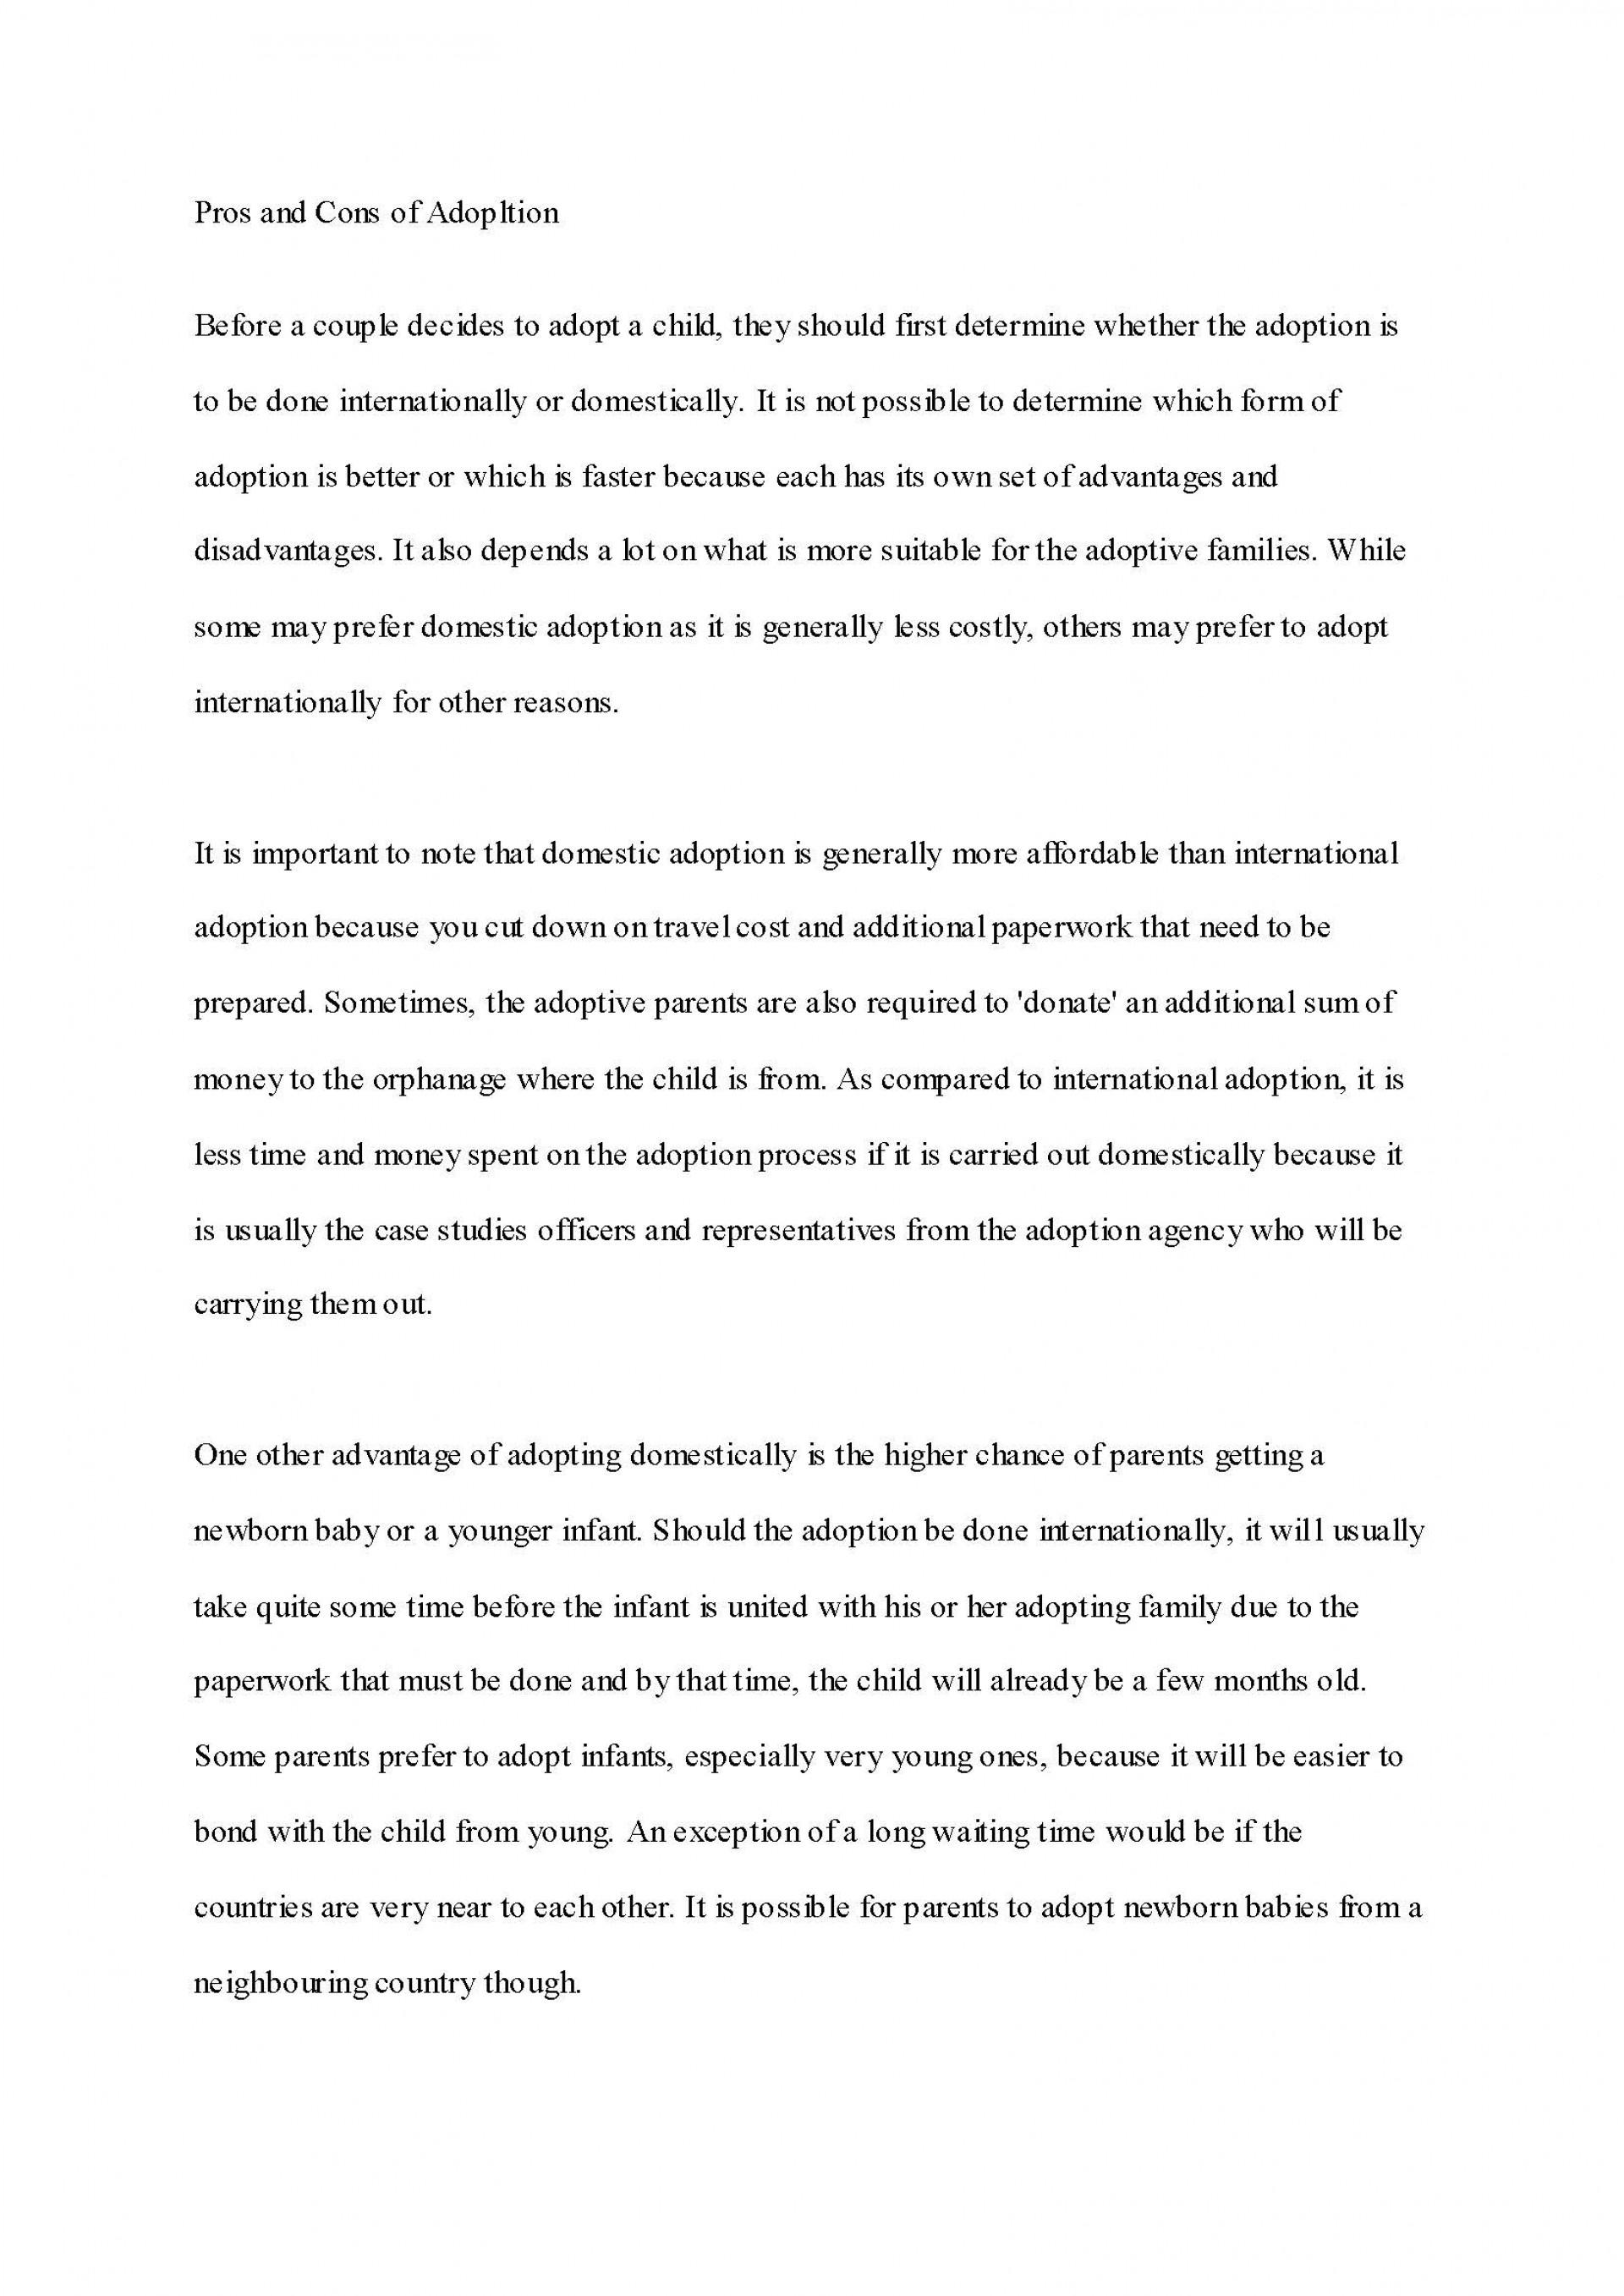 013 Rogerian Argument Essay Example Adoption Staggering Topics 1920